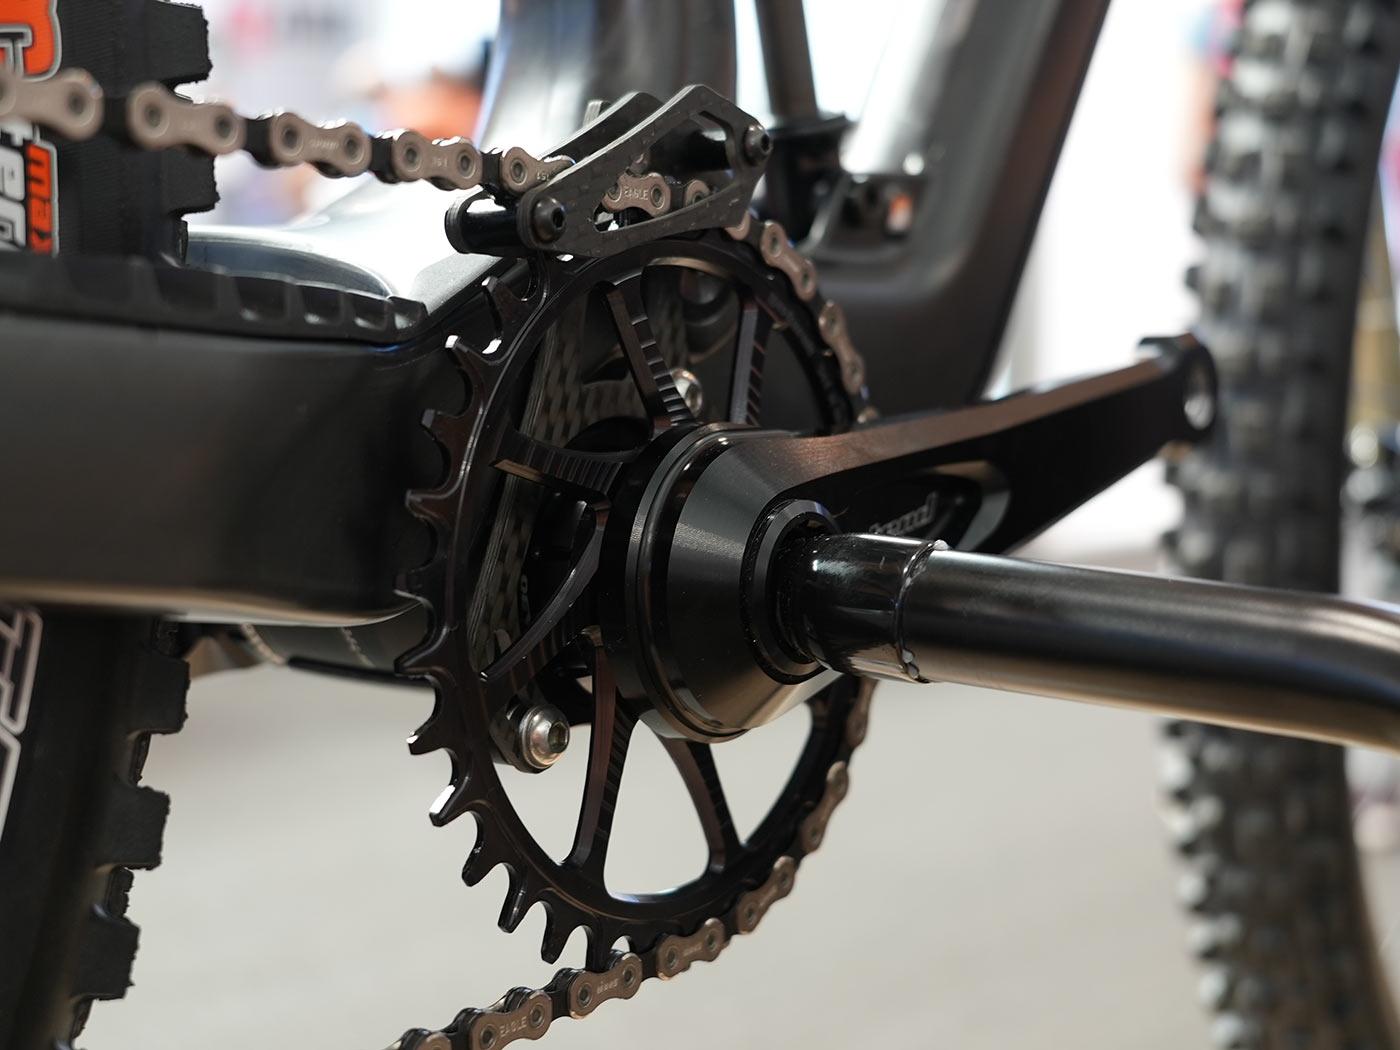 intend rocksteady magic crankset with freewheel chainring mount